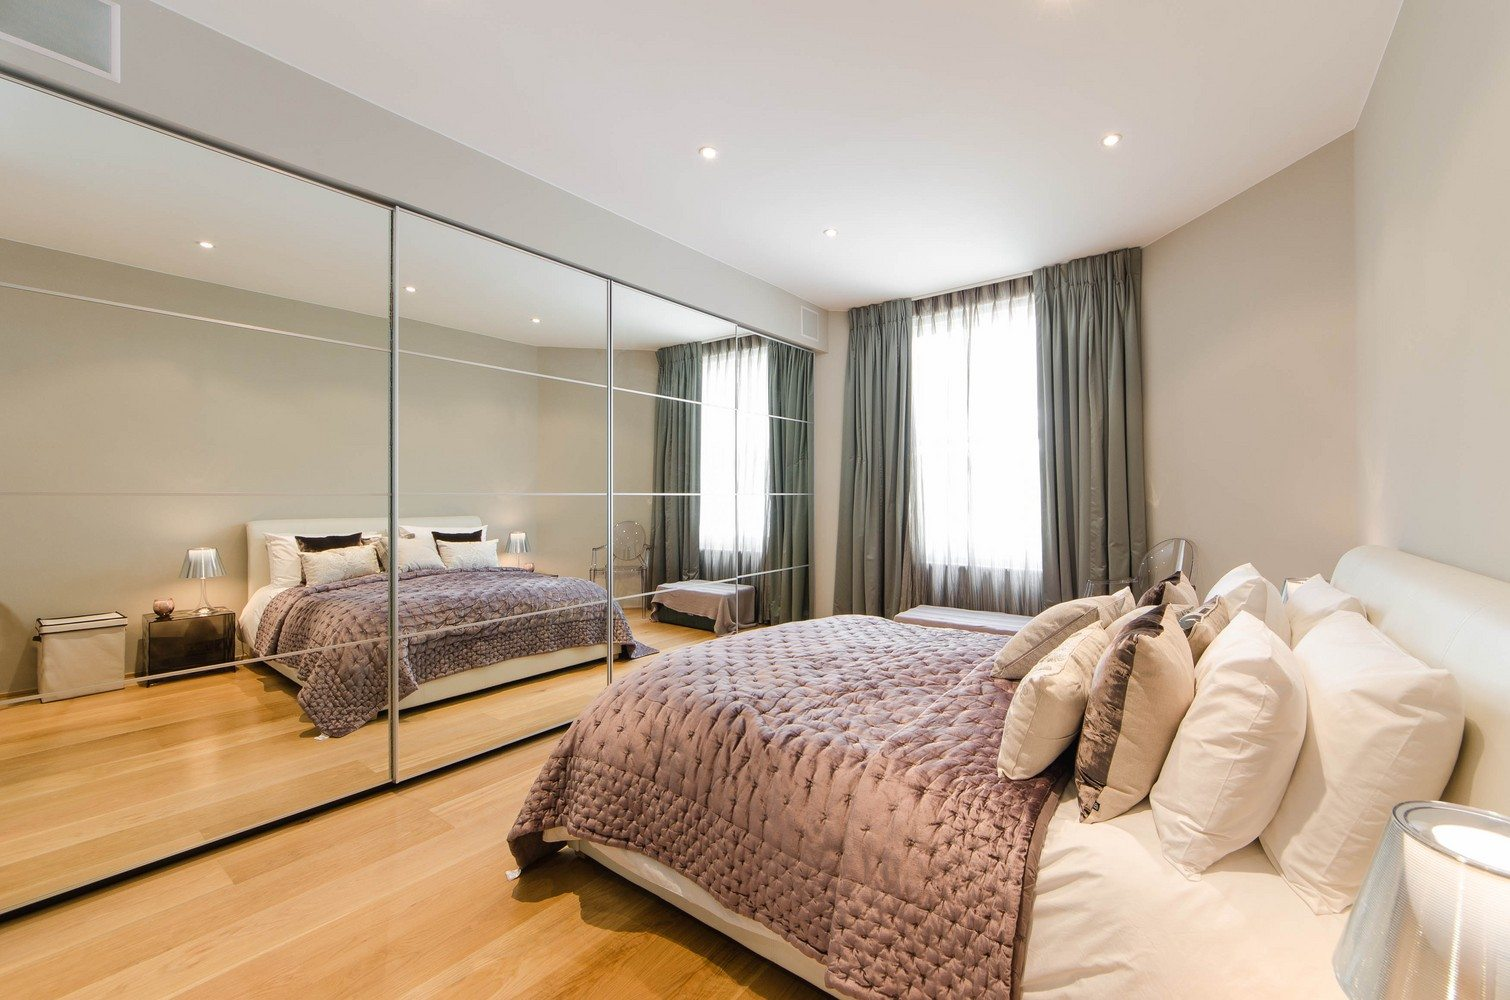 Luxury-Apartments-South-Kensington---Spacious-Bedroom